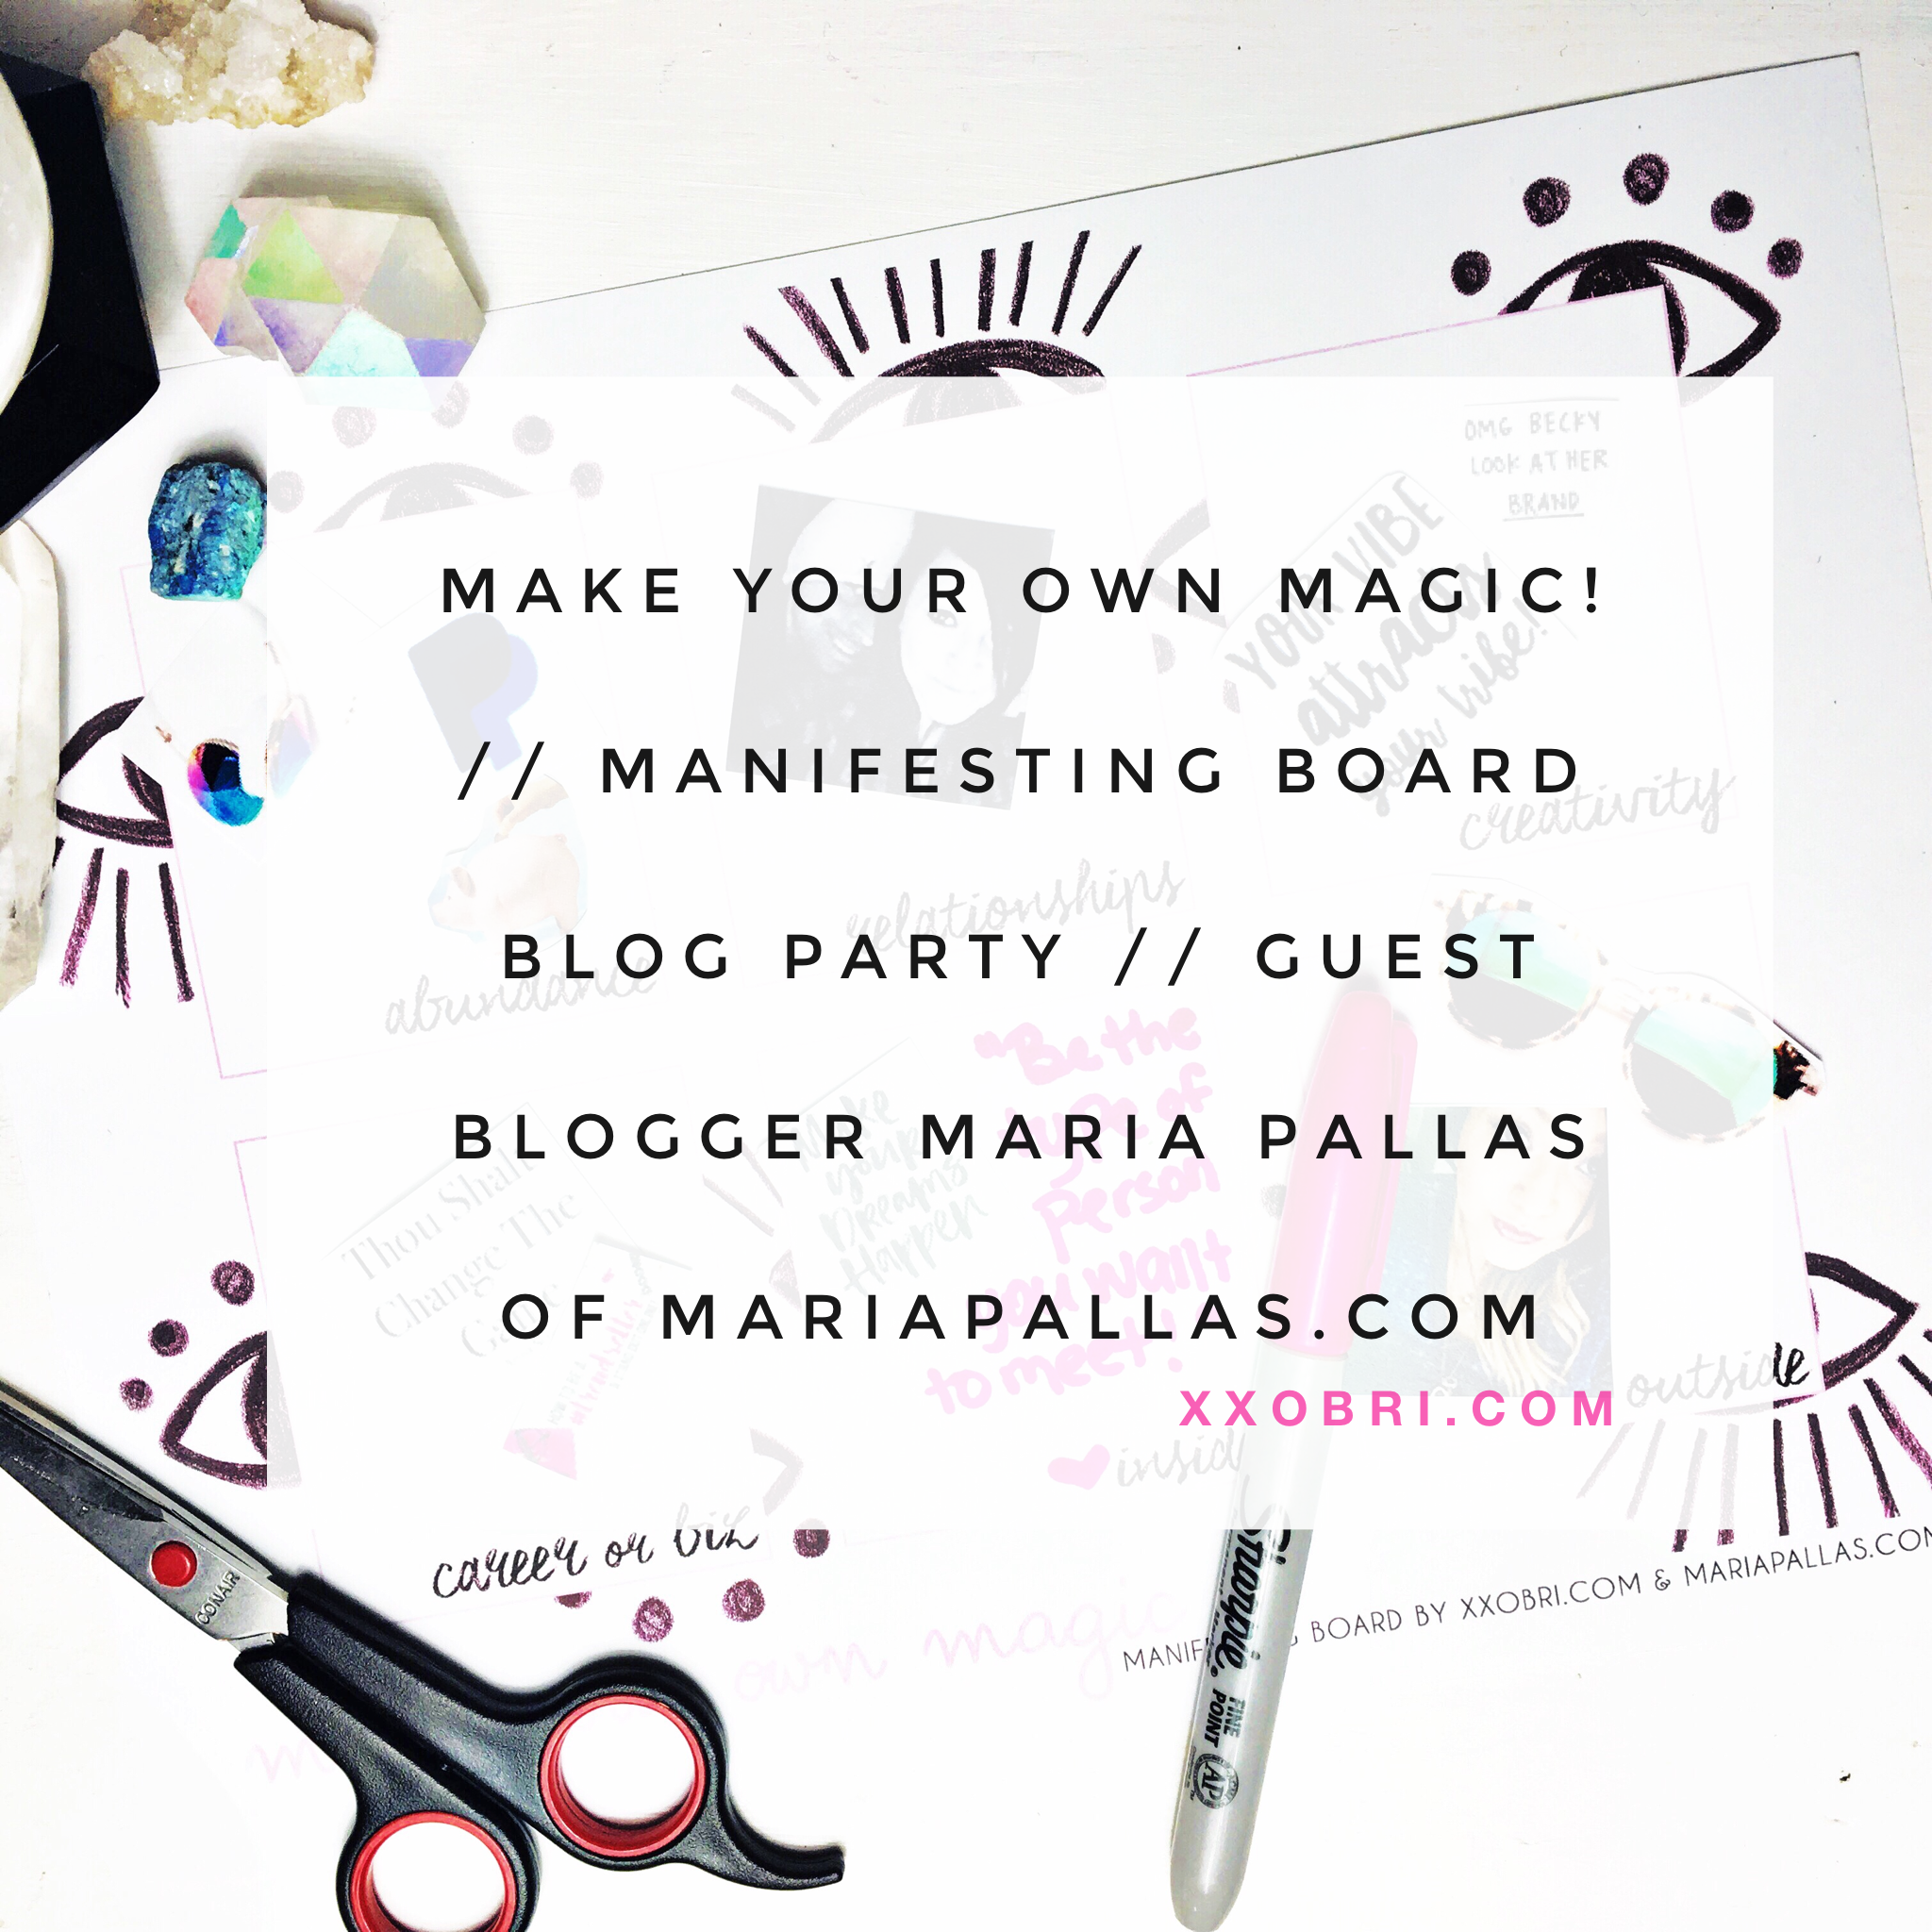 make_your_own_magic_manifest_board_xxobri.PNG